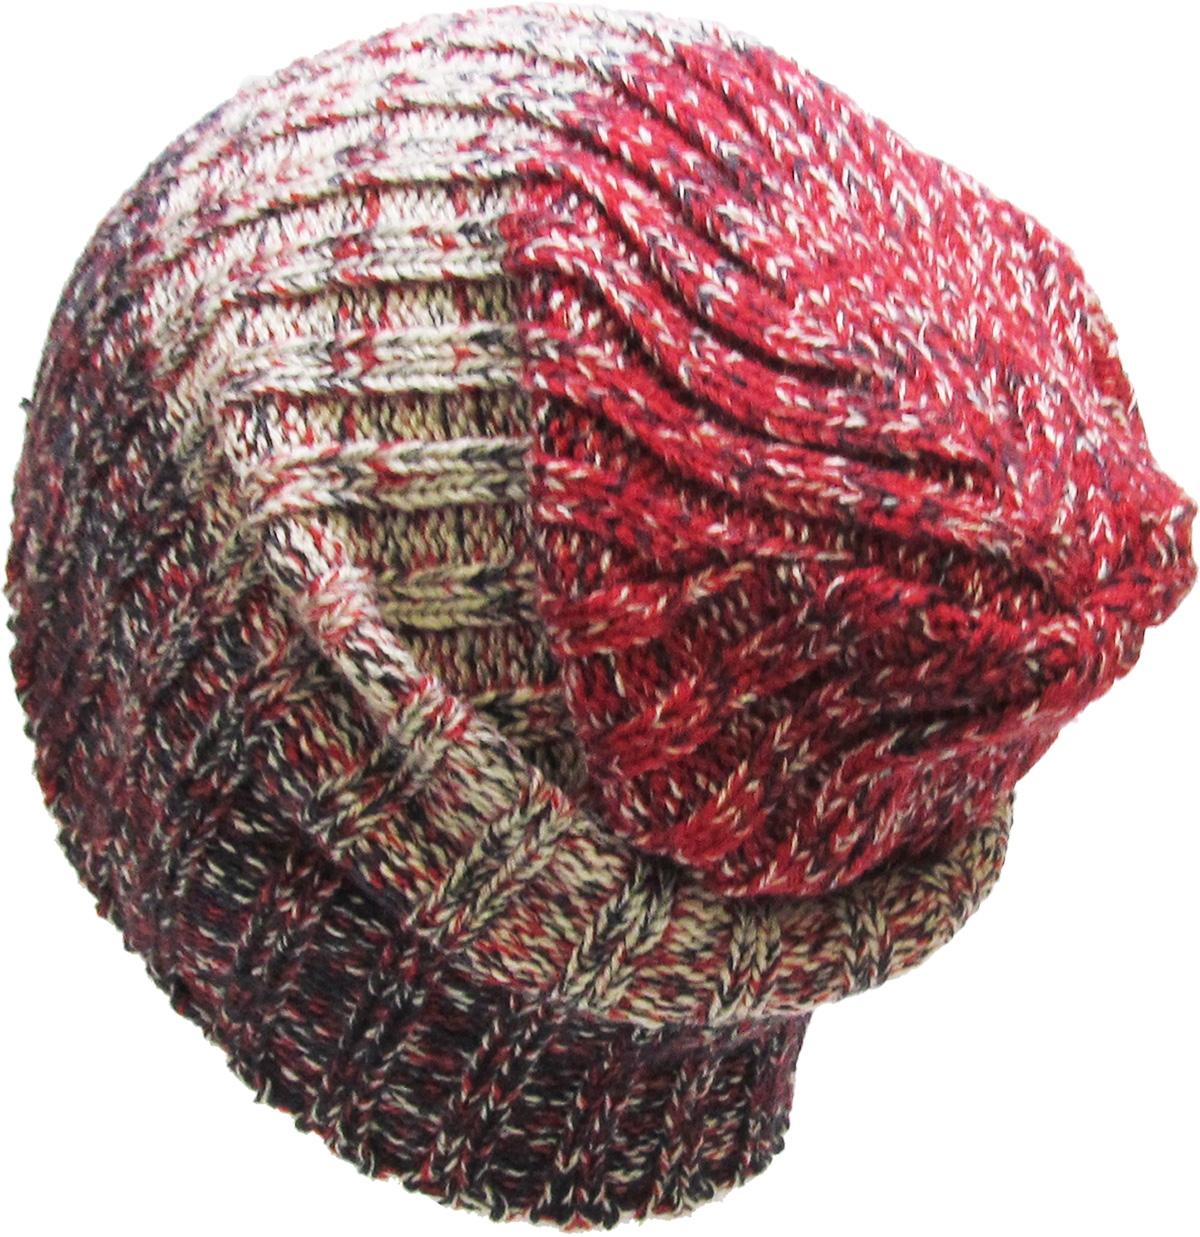 c1ee9ca1375 Gray Tri Tone Ribbed Knit Slouchy Beanie Baggy Style Skull Cap Winter  Unisex Ski Hat - Walmart.com